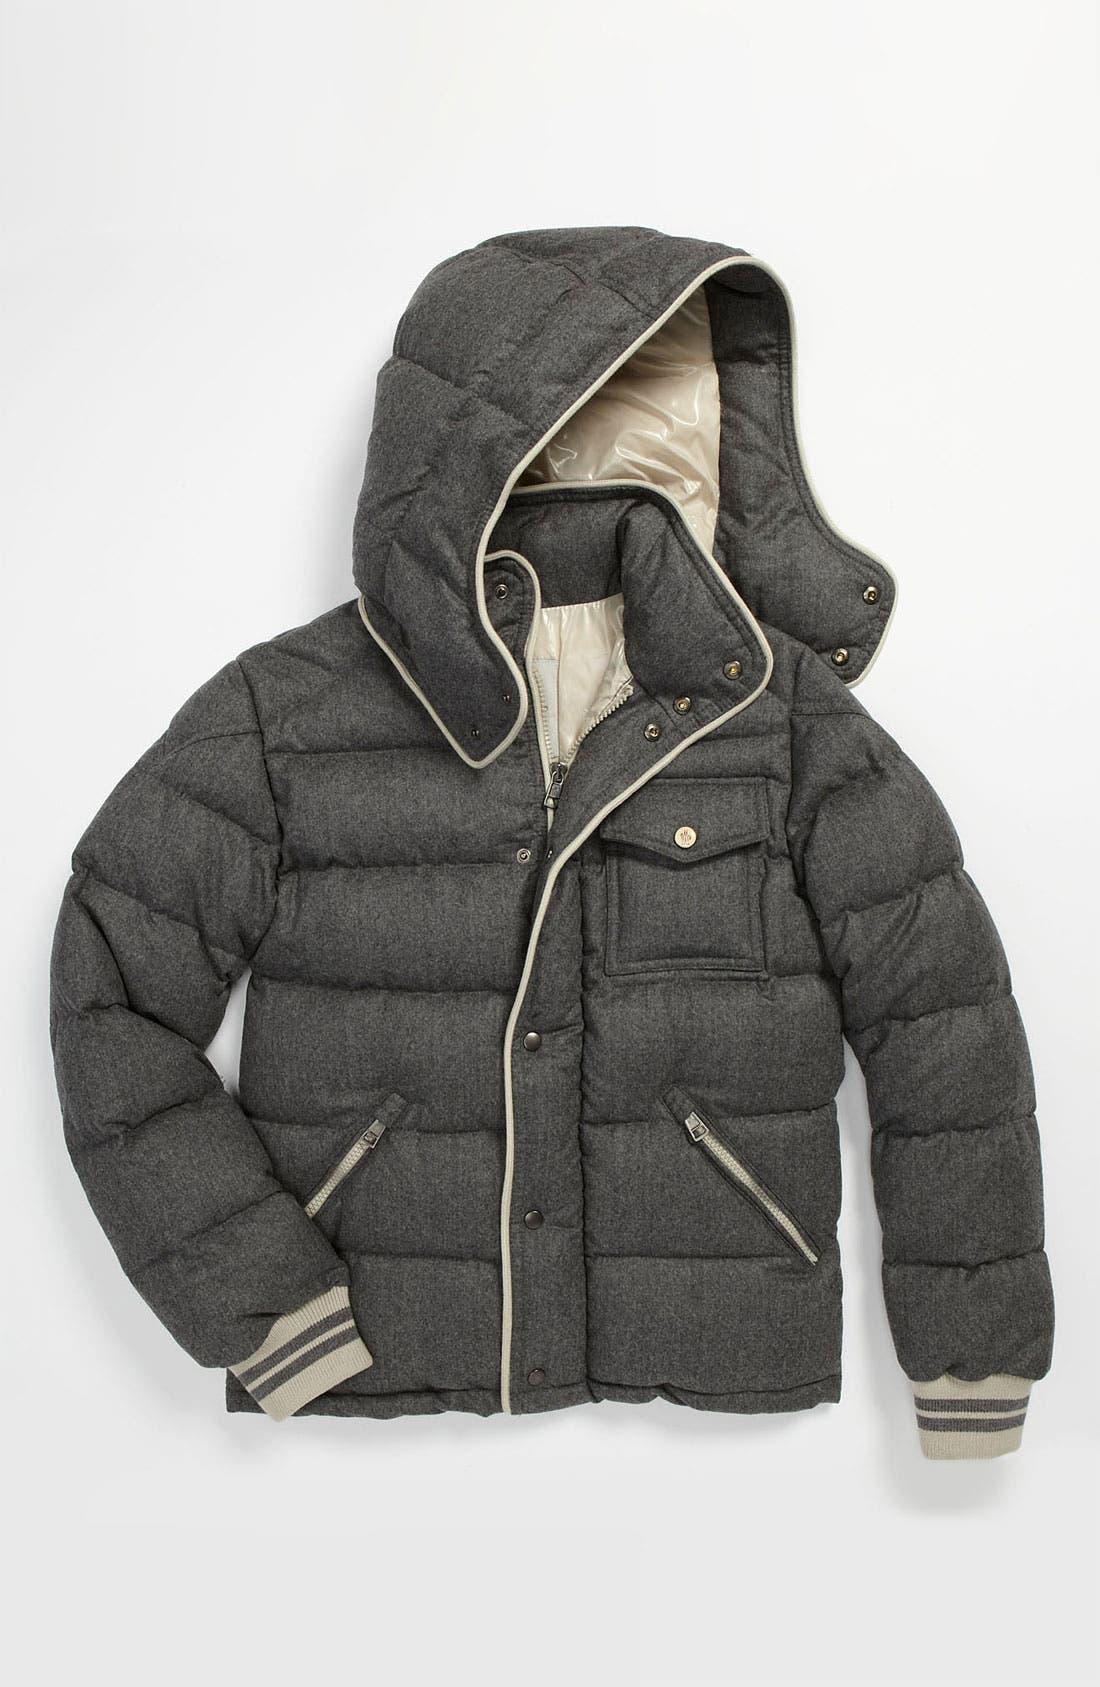 Alternate Image 1 Selected - Moncler 'Rhin' Wool Puffer Jacket (Big Boys)